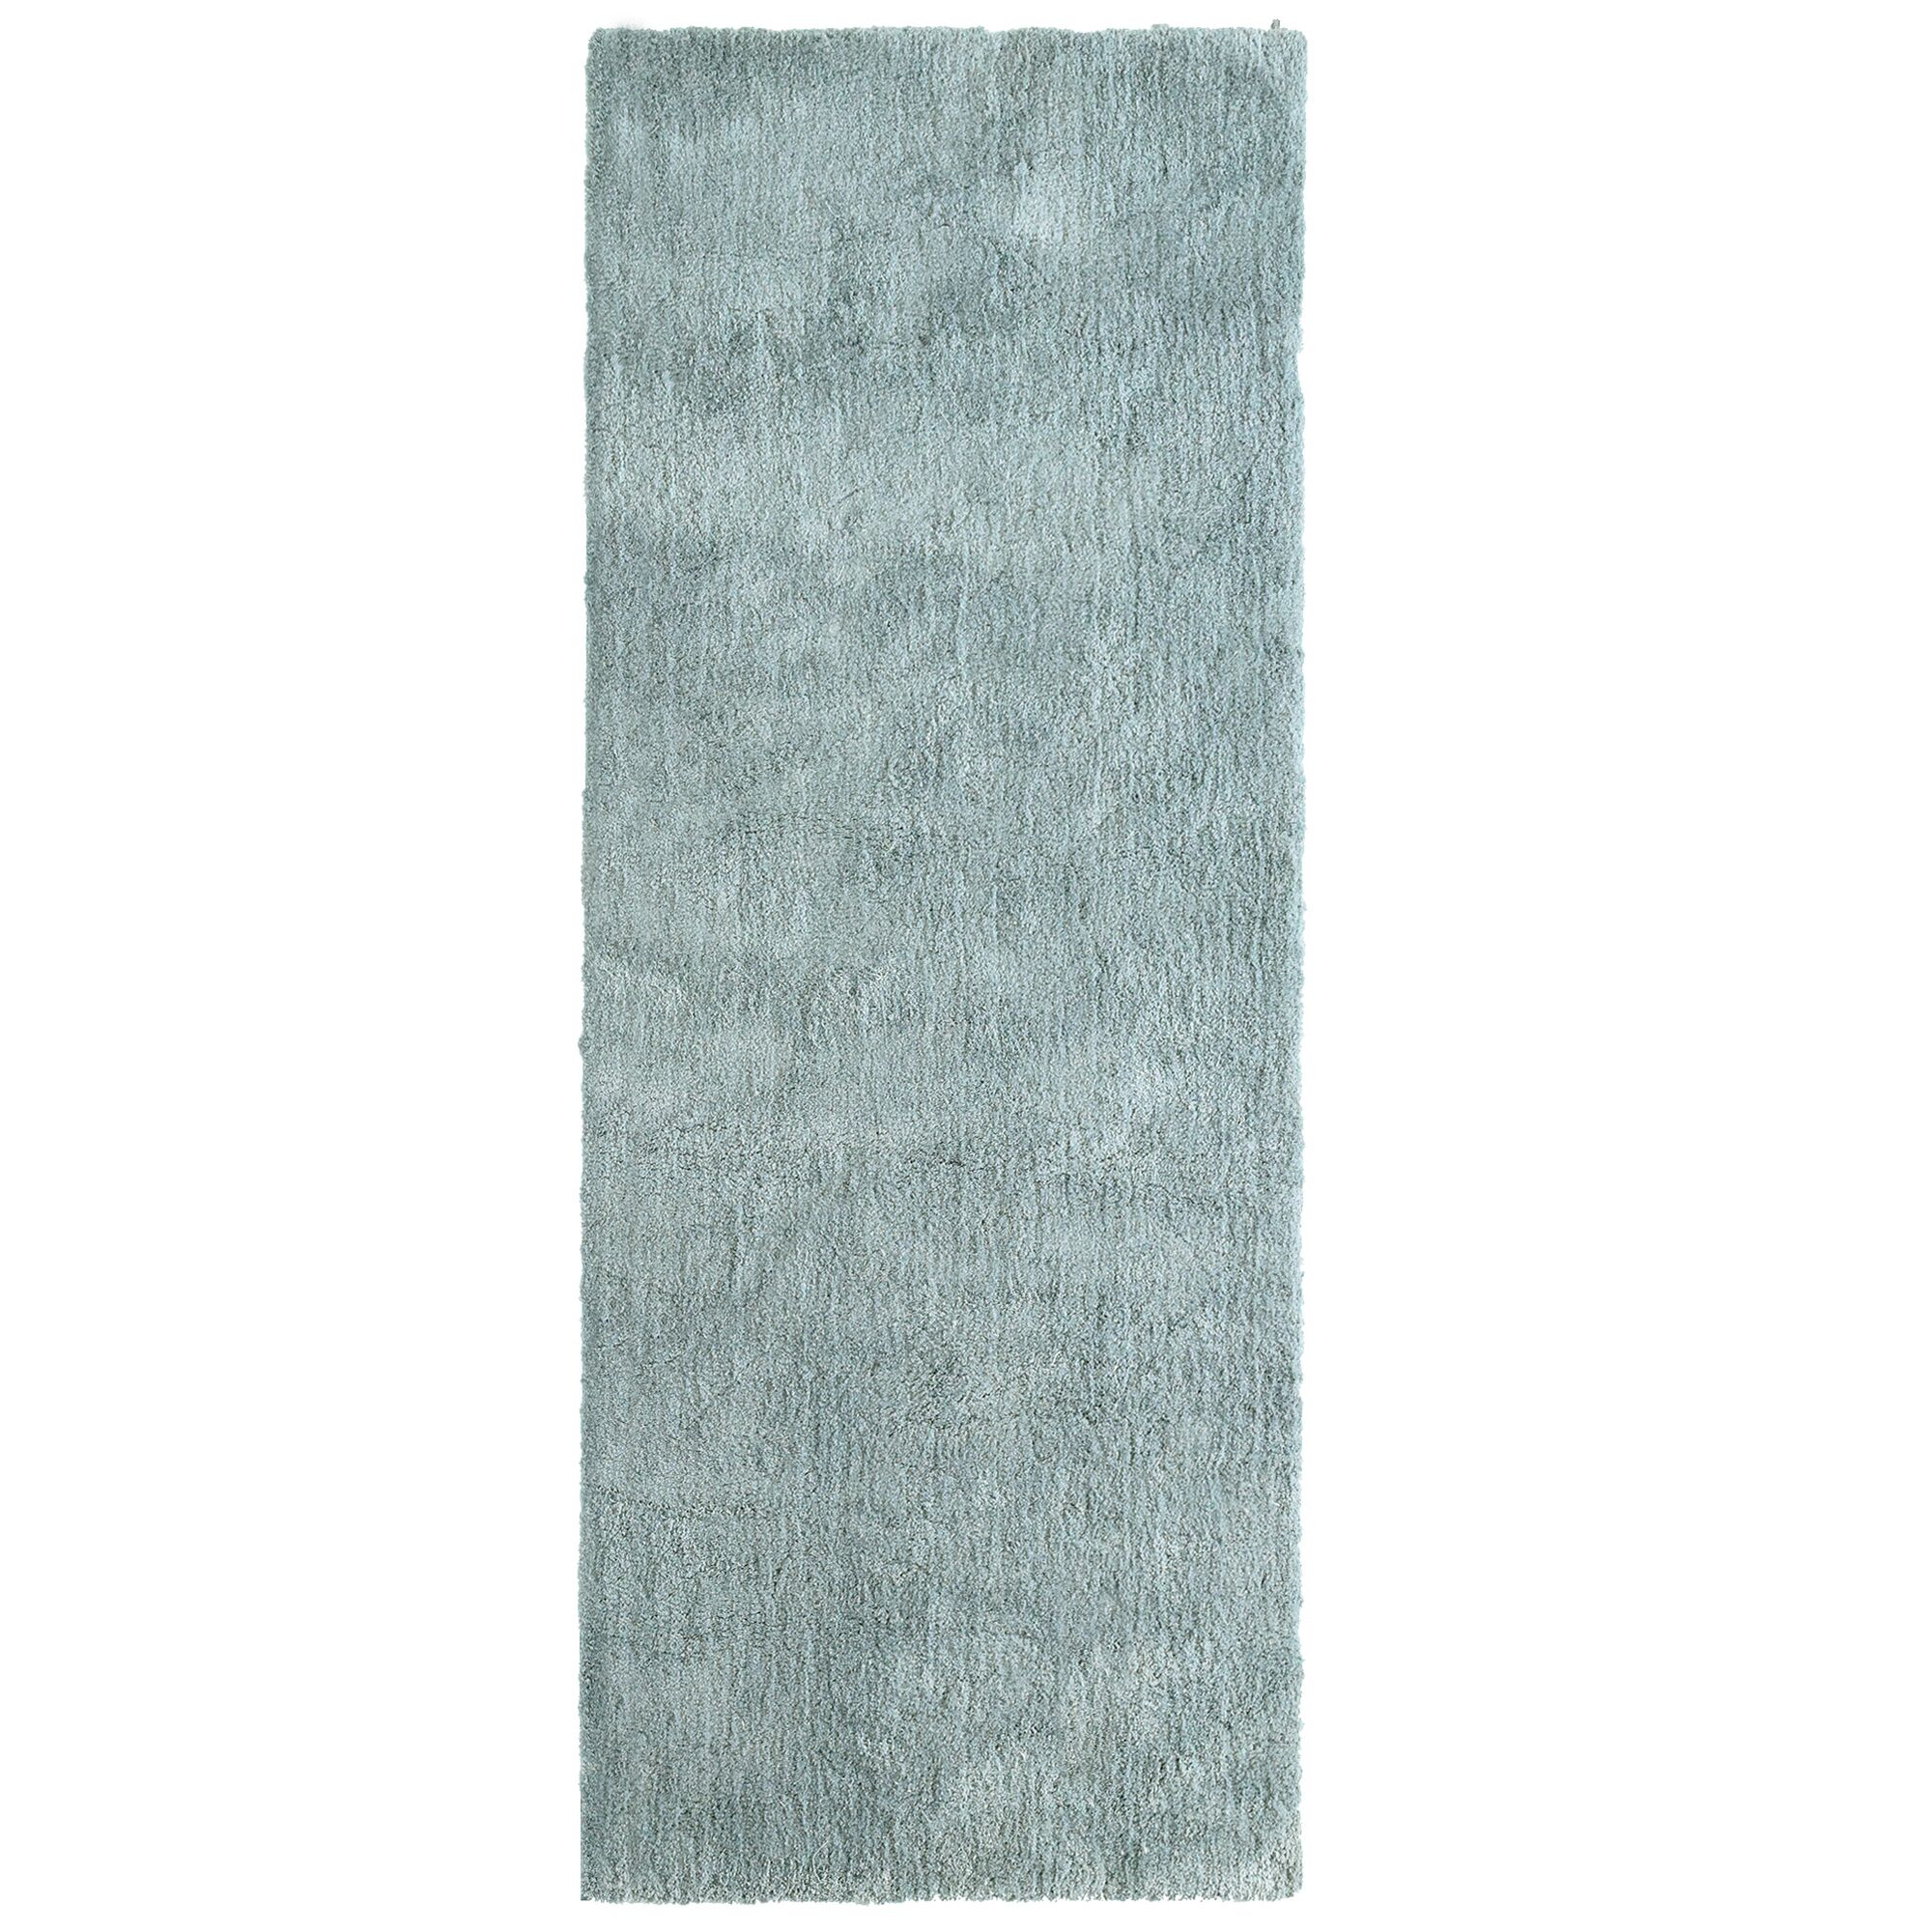 Fluffy Silver Area Rug Rug Size: 6' x 9'